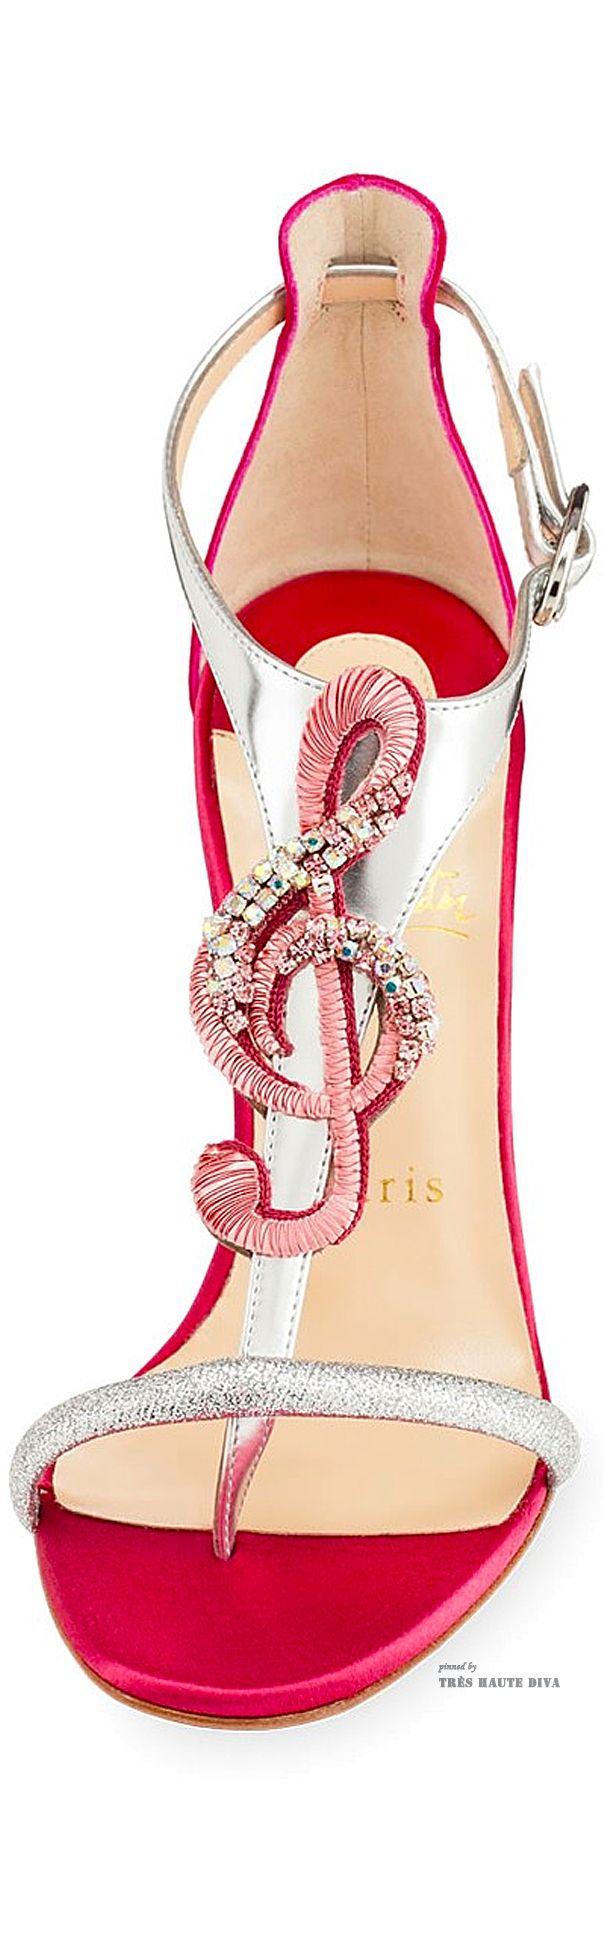 Christian Louboutin \u0027Melodie\u0027 Sandal #CL #Louboutins #Shoes #redsoles